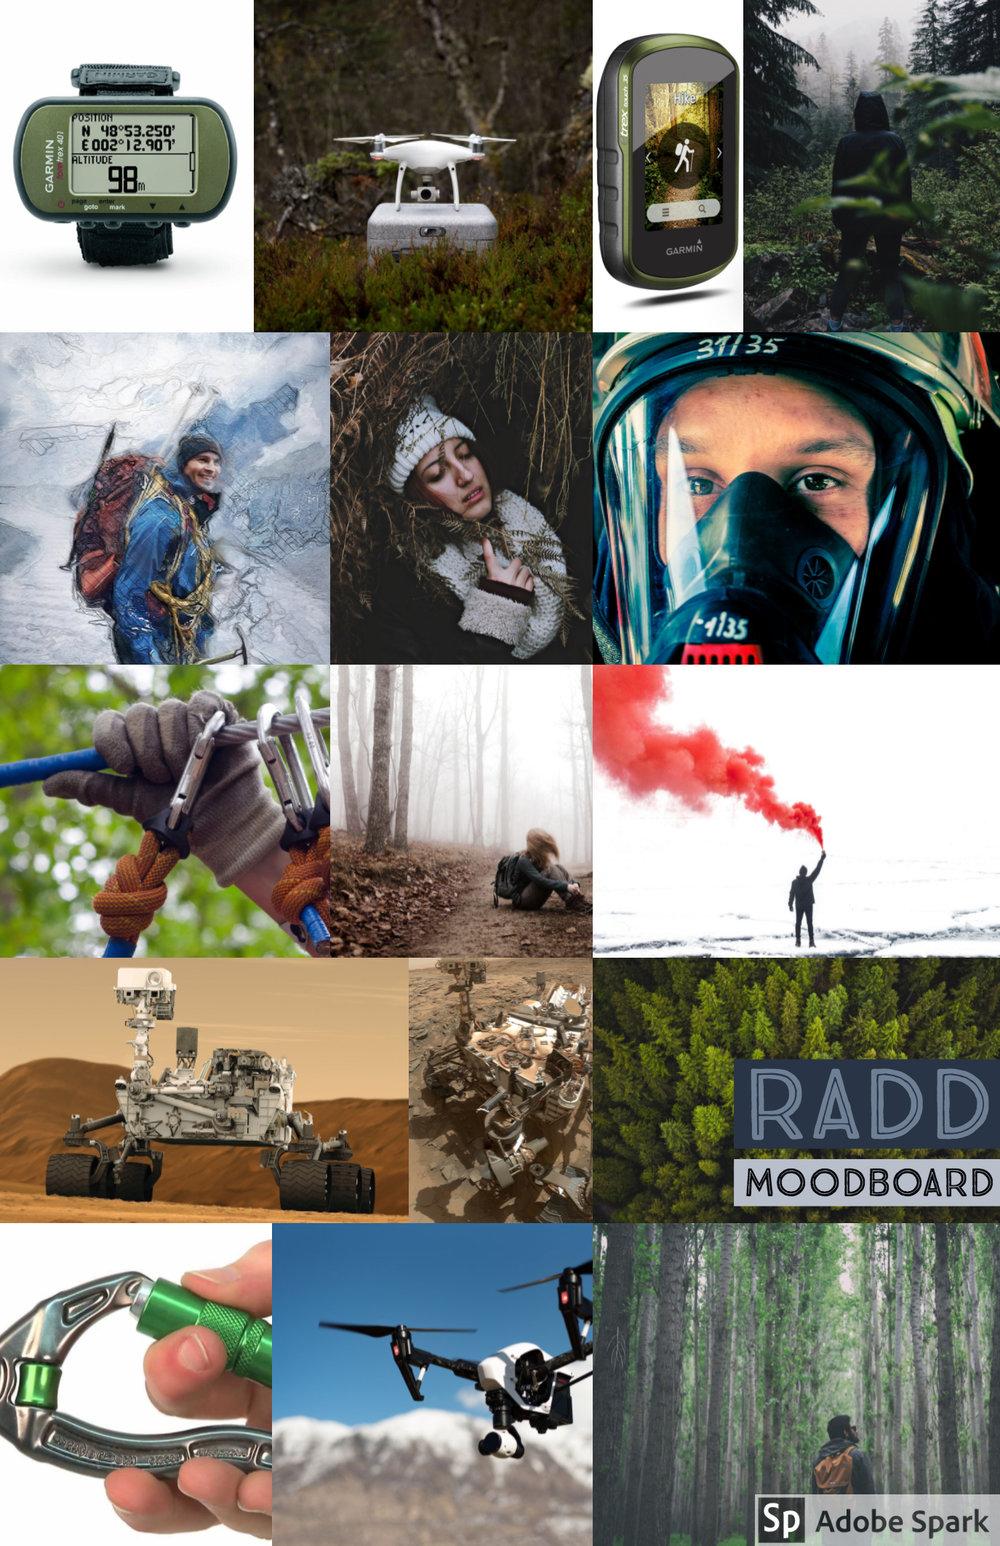 RADD MOODBOARD.jpg